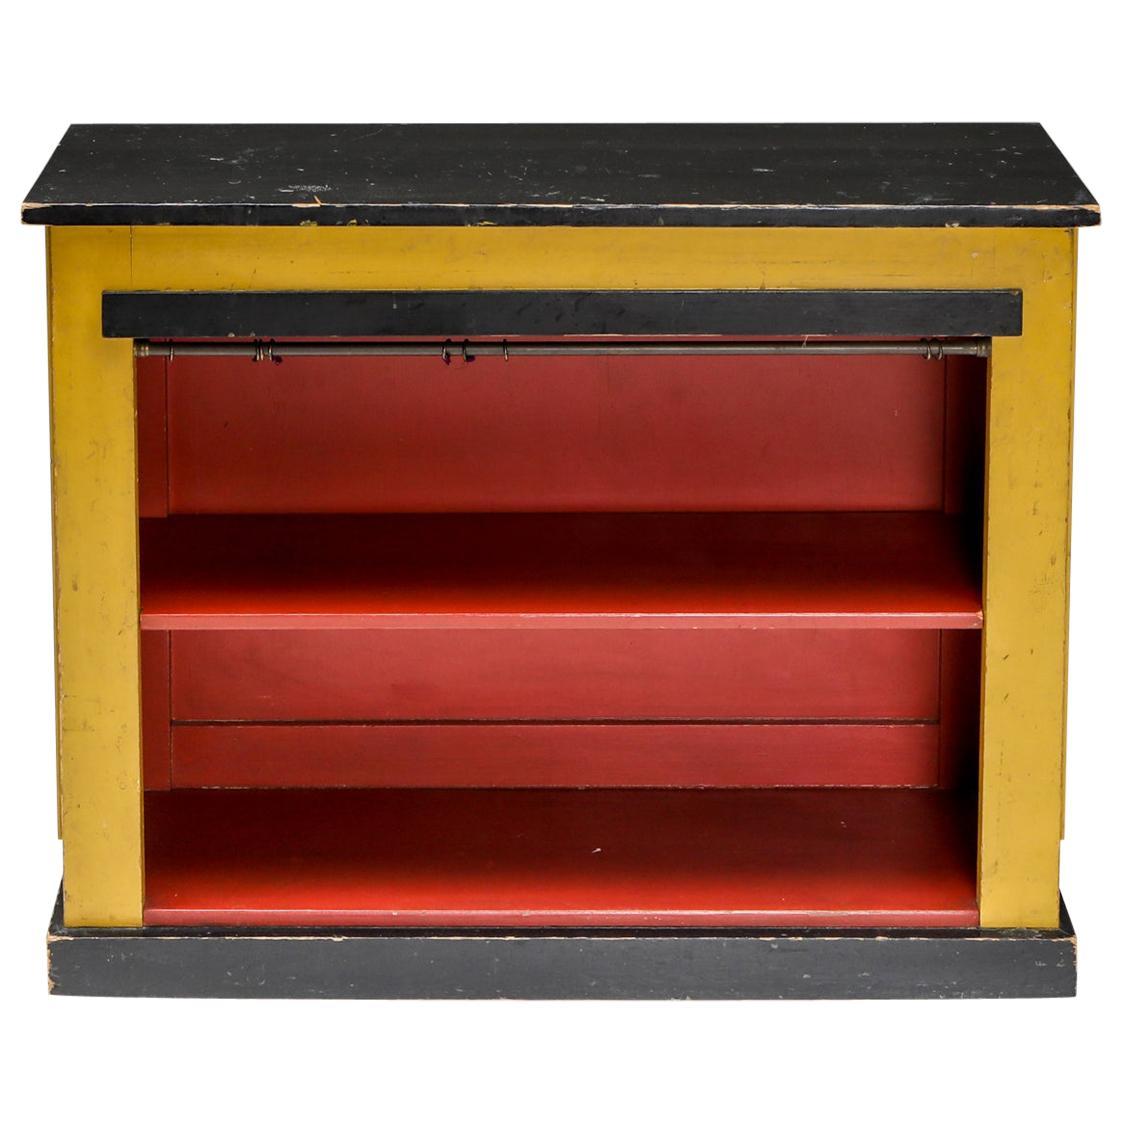 Shelve Cabinet by Dutch Modernist H.Wouda, 1924